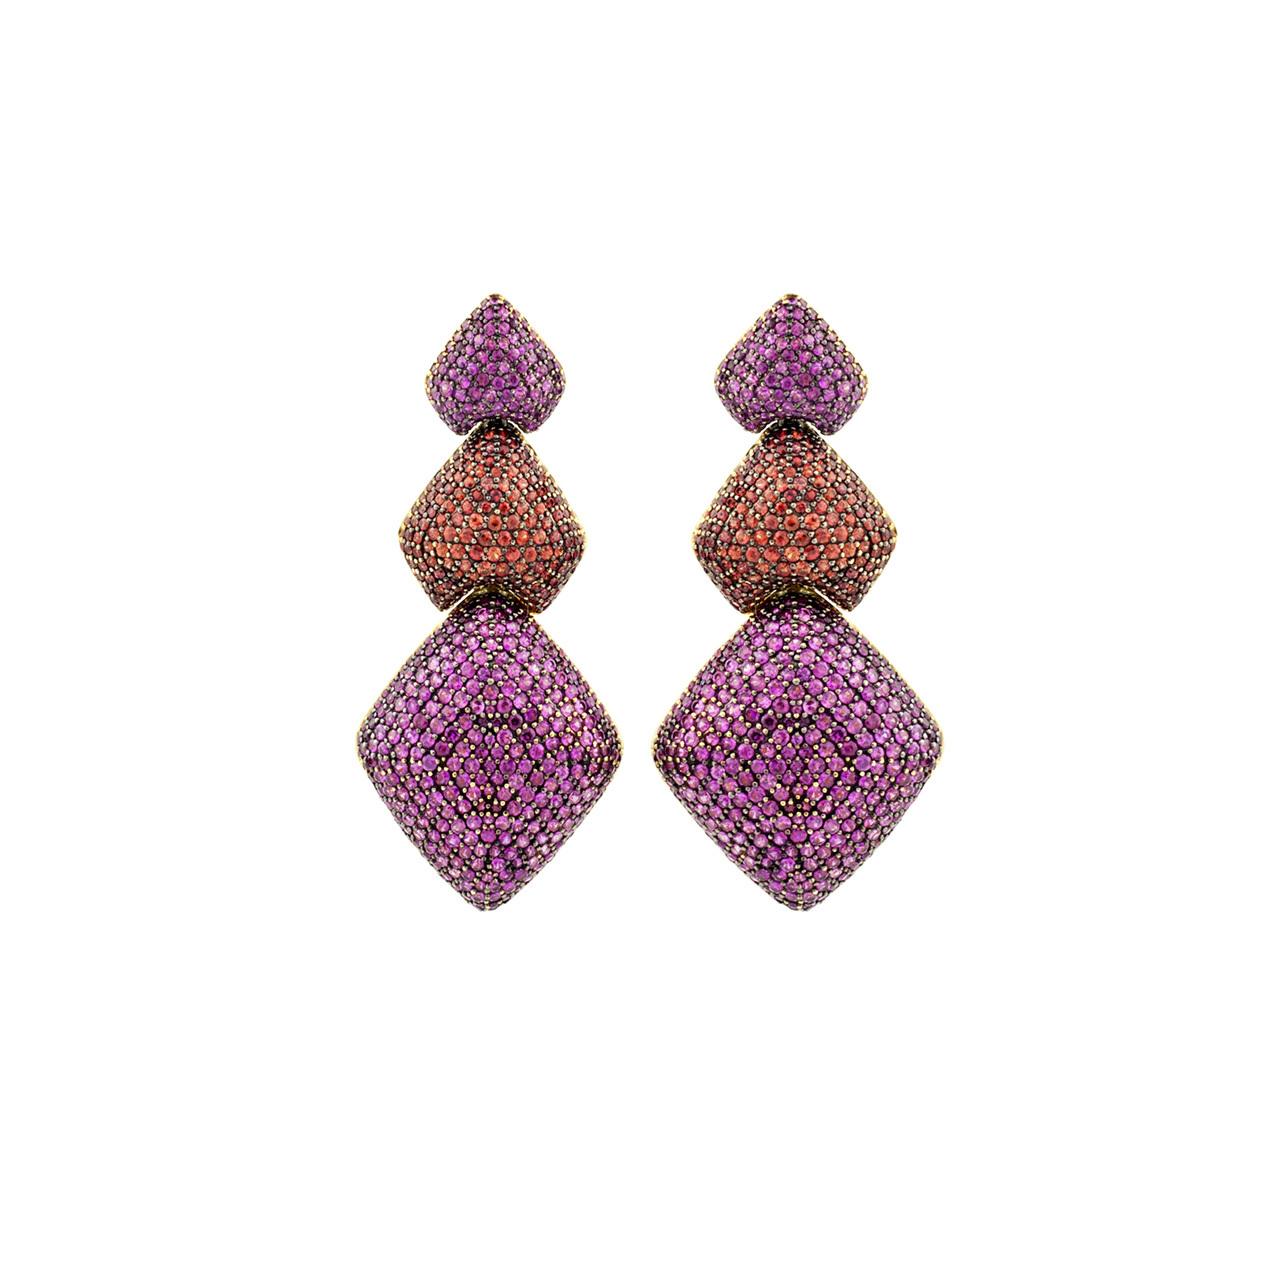 Hydra Triple Diamond Drops  In pink and orange sapphires, $13,995.